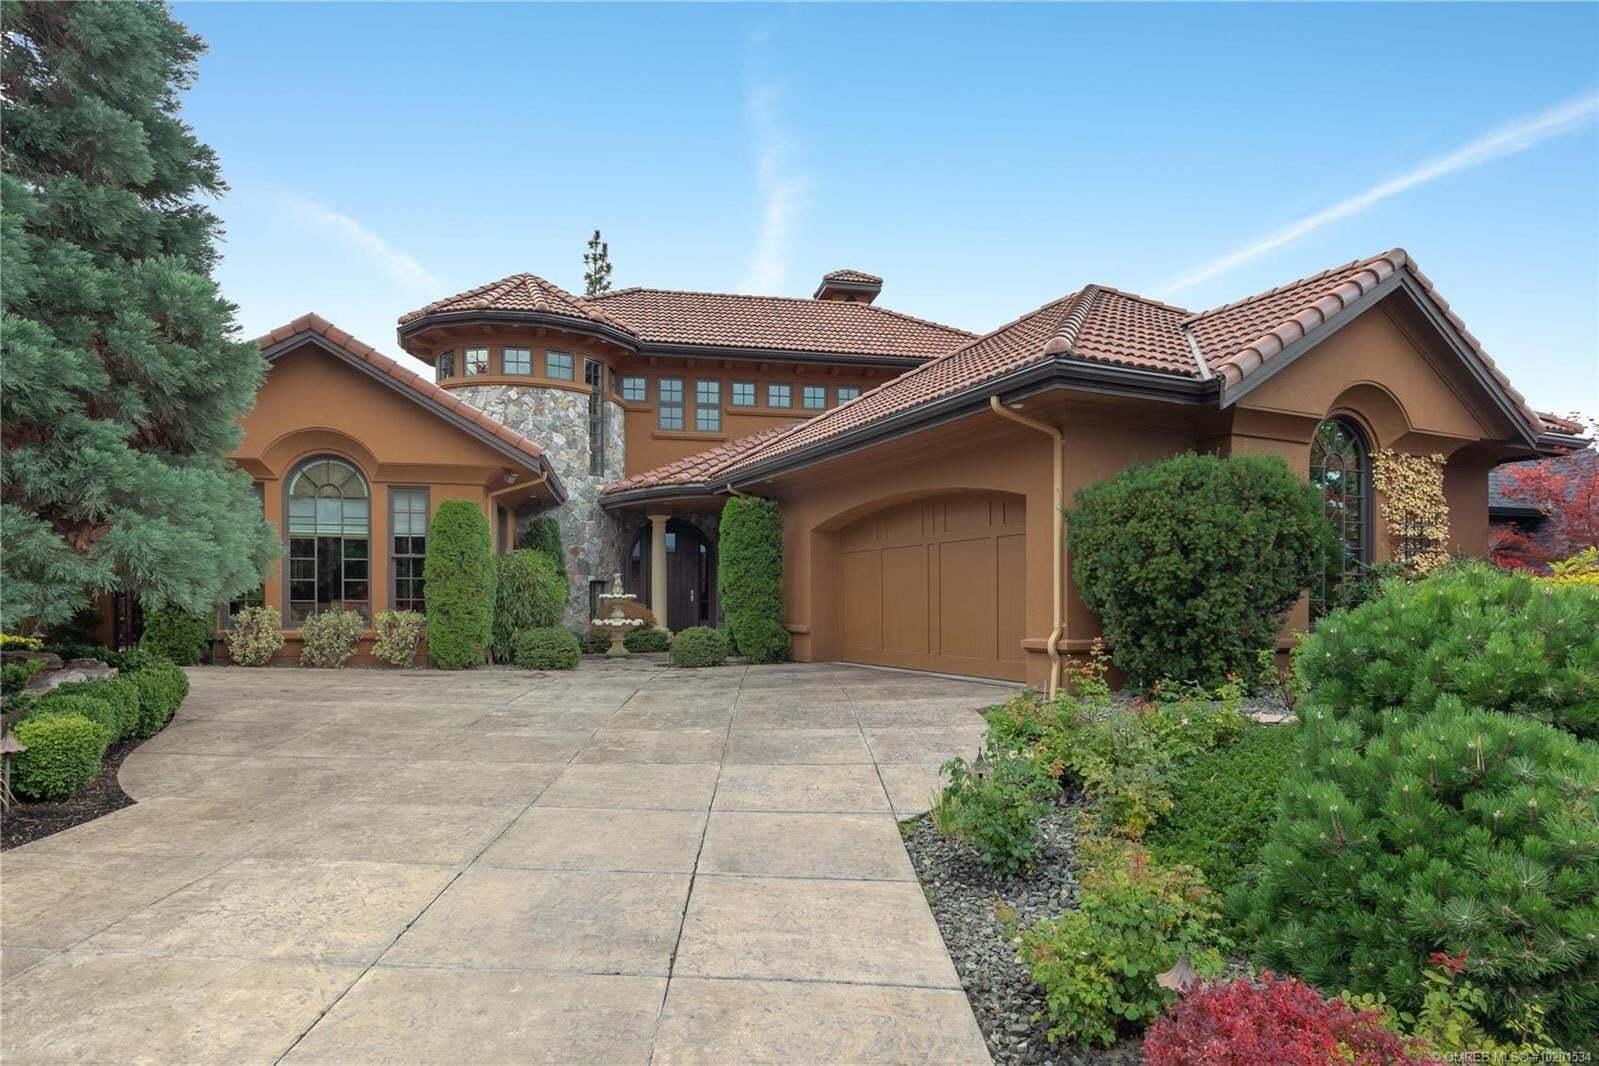 House for sale at 983 Westpoint Dr Kelowna British Columbia - MLS: 10201534